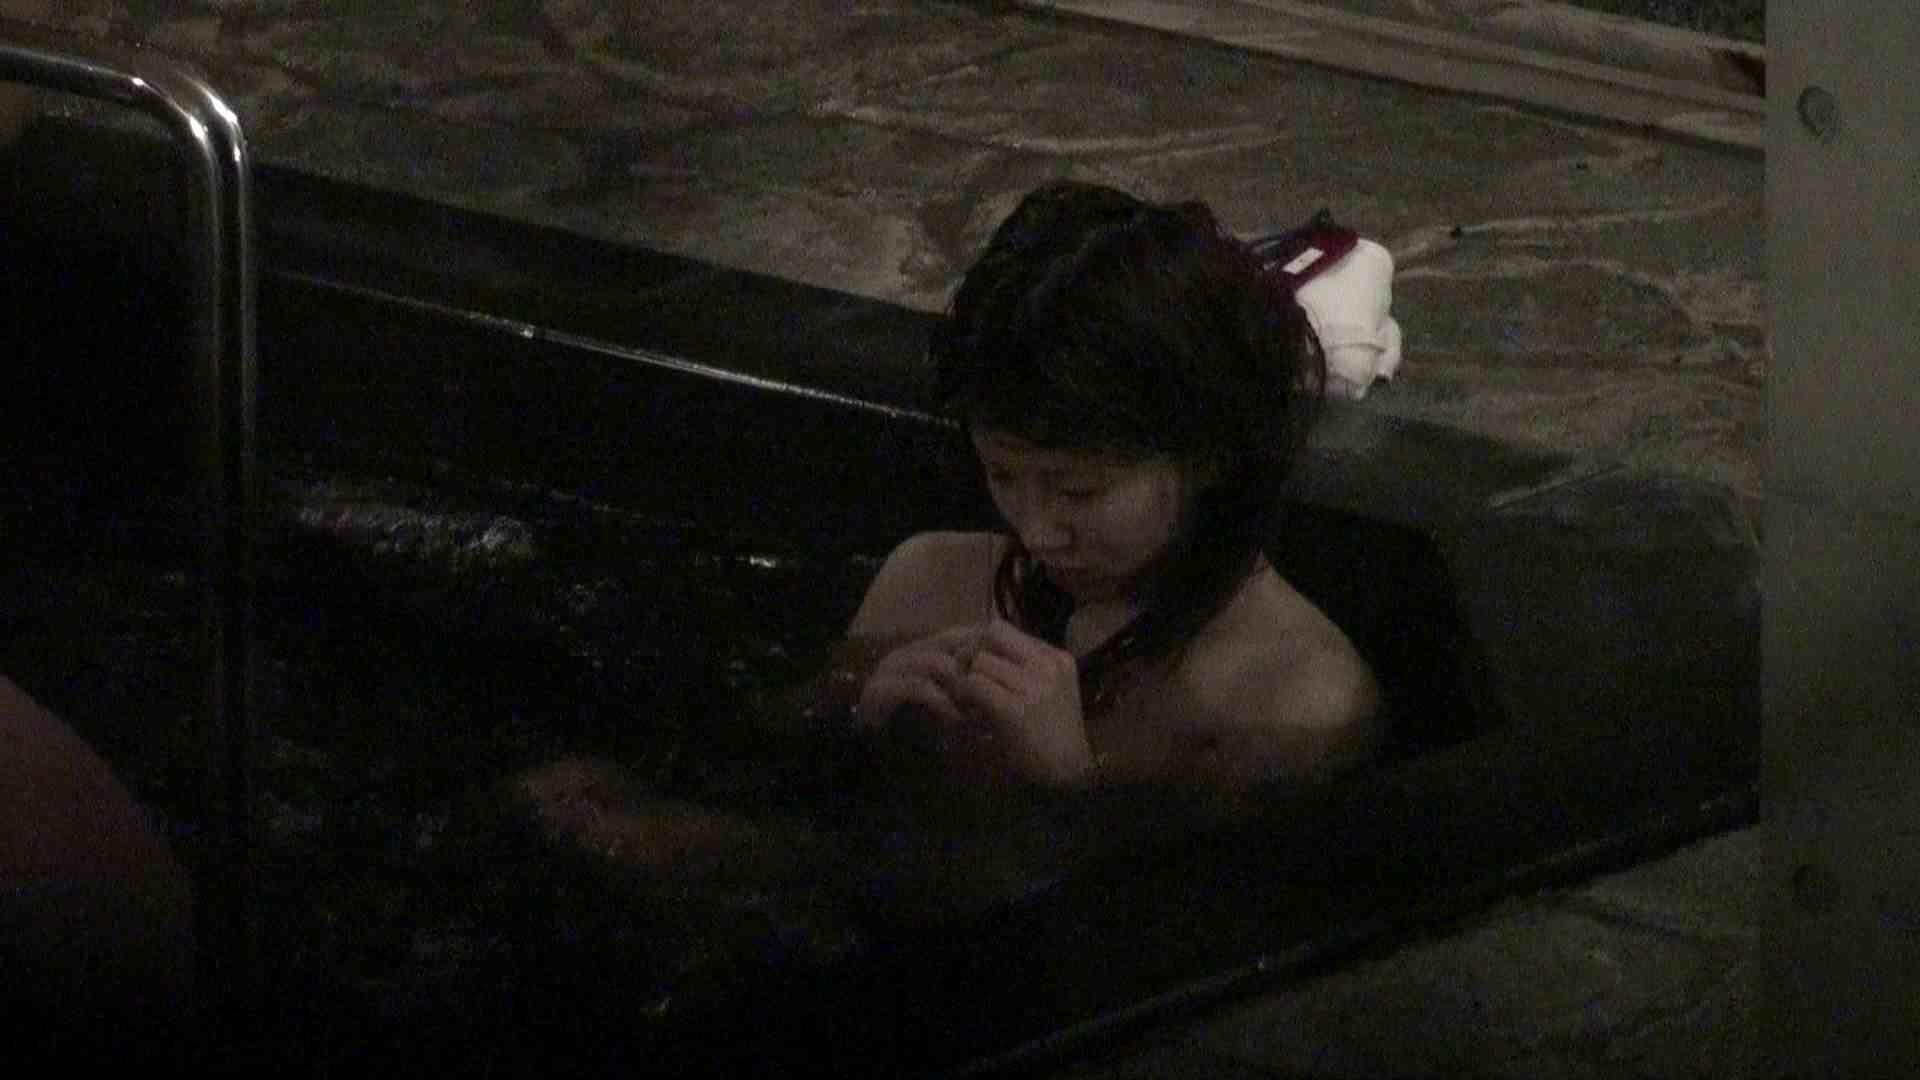 Aquaな露天風呂Vol.371 盗撮大放出 性交動画流出 92連発 73